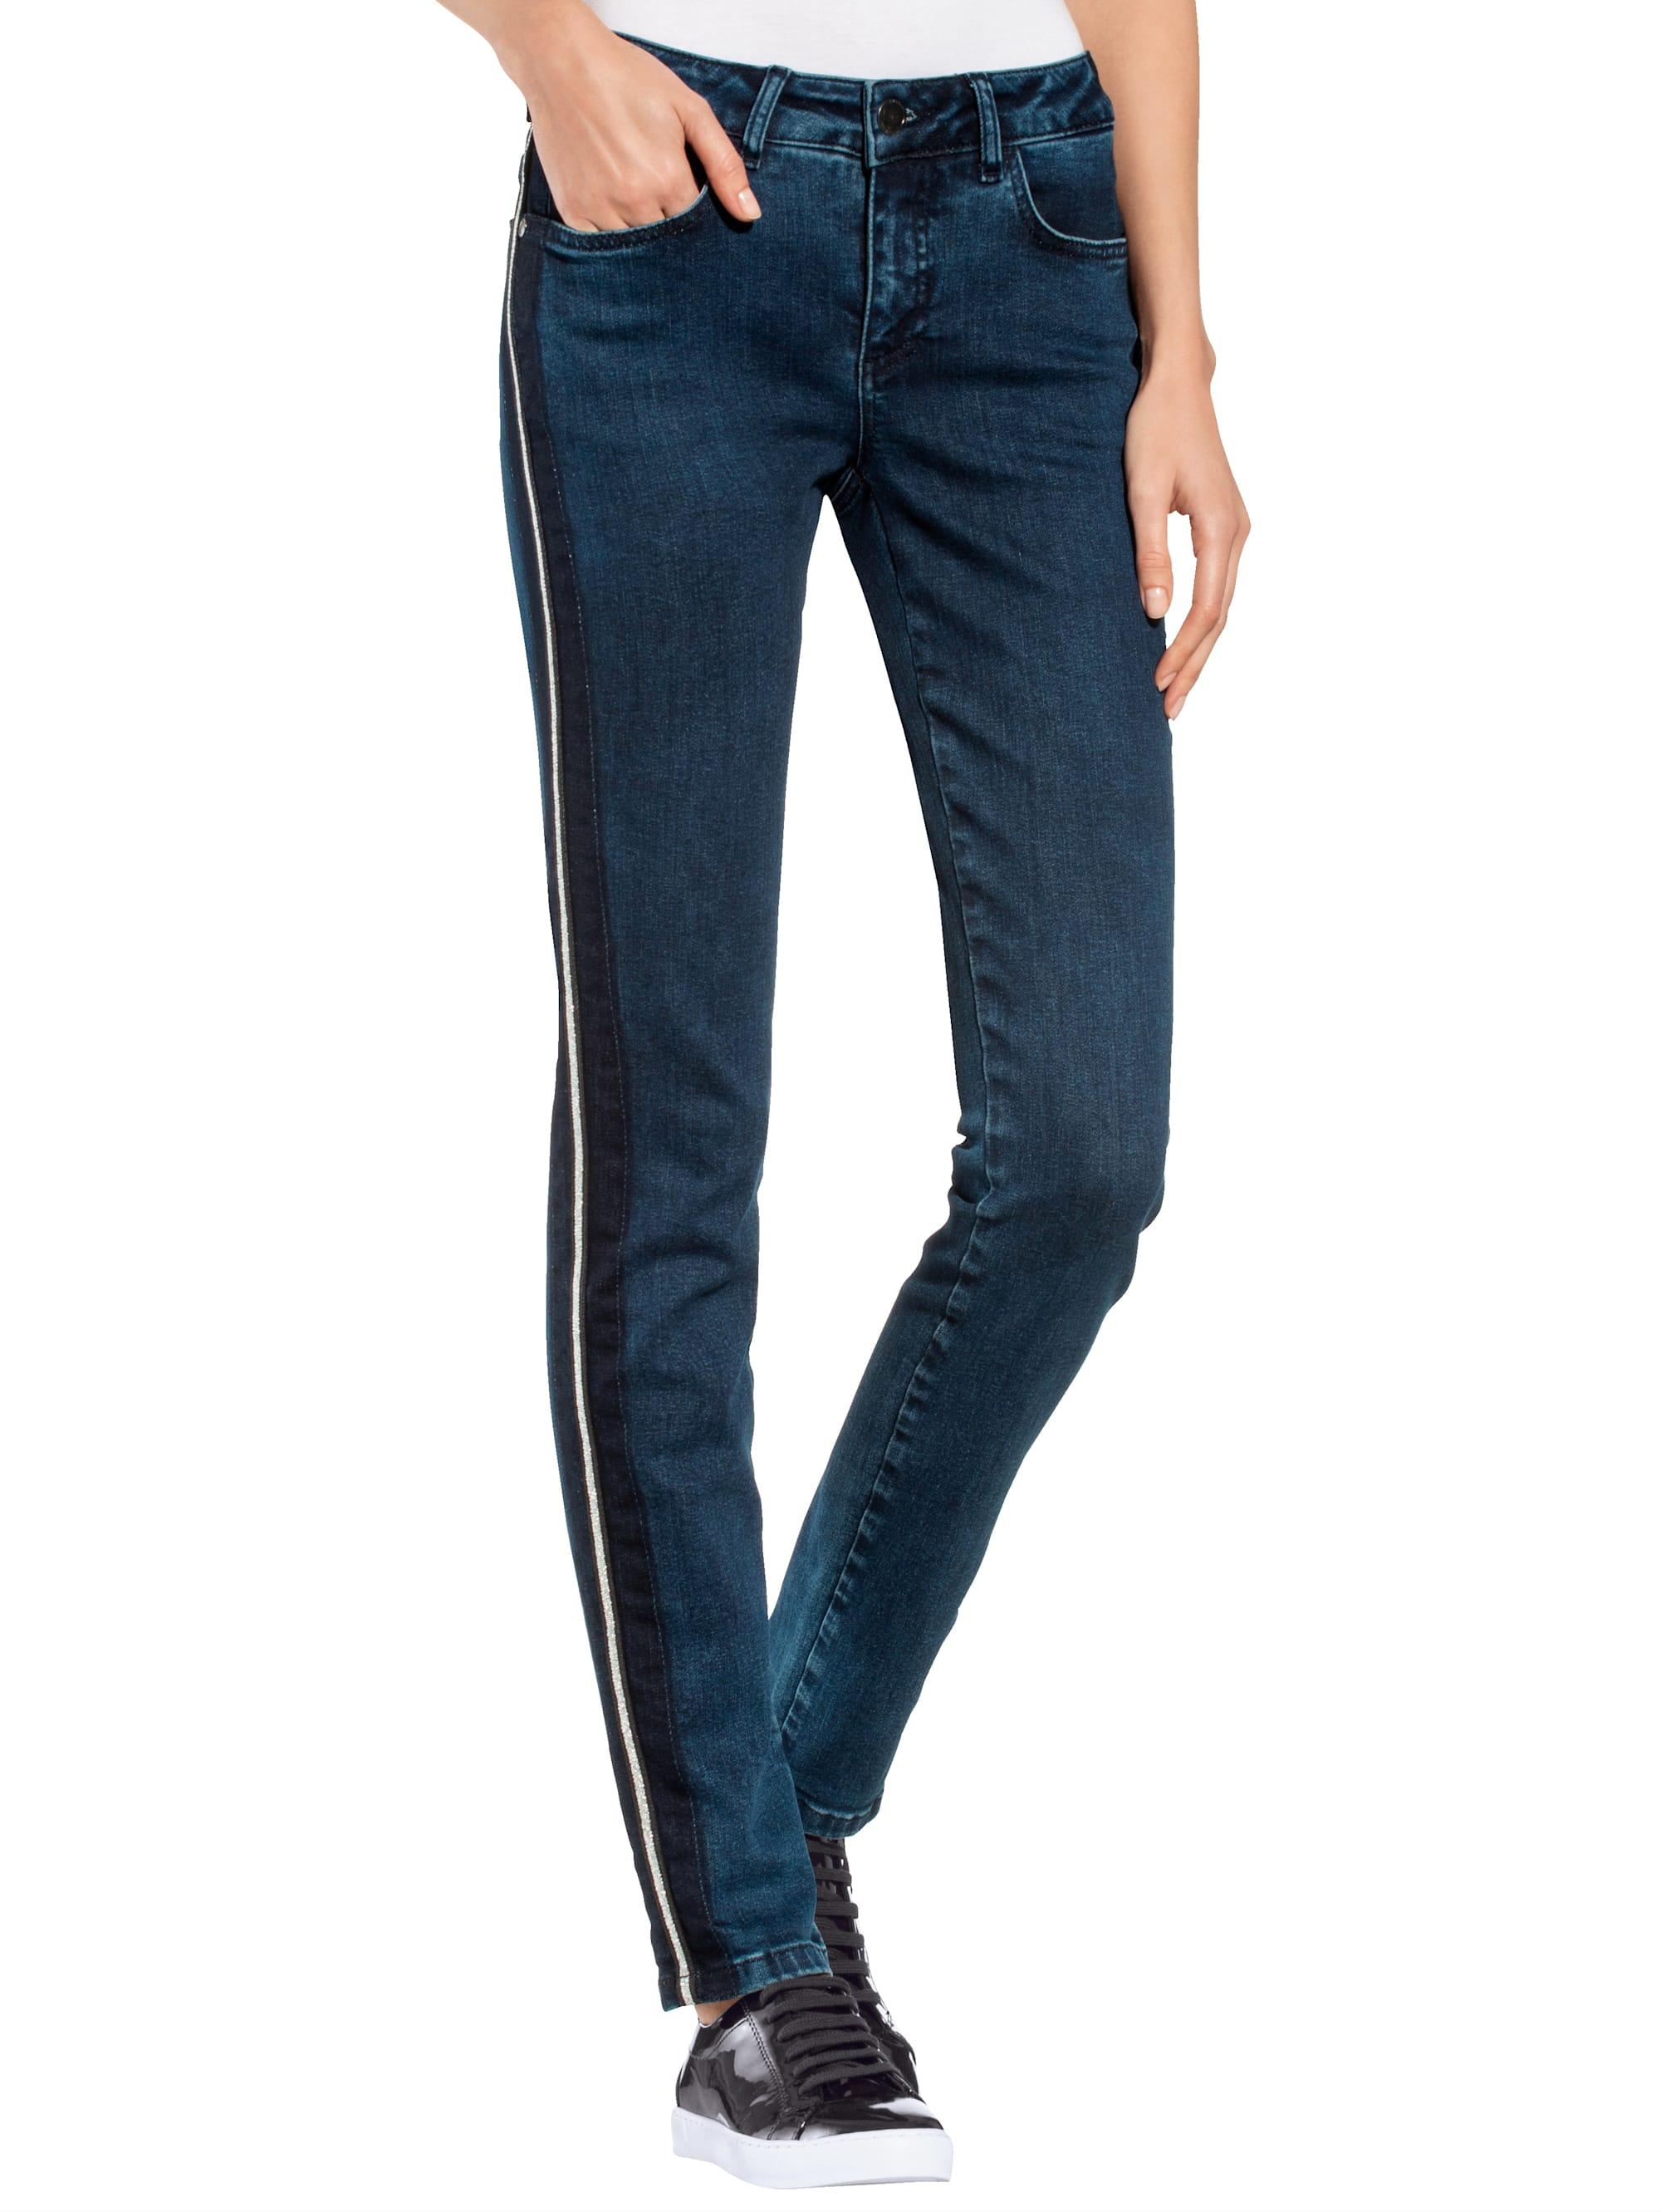 Alba Moda Jeans mit schmückender Seitenpaspel npiL7 KR9WO